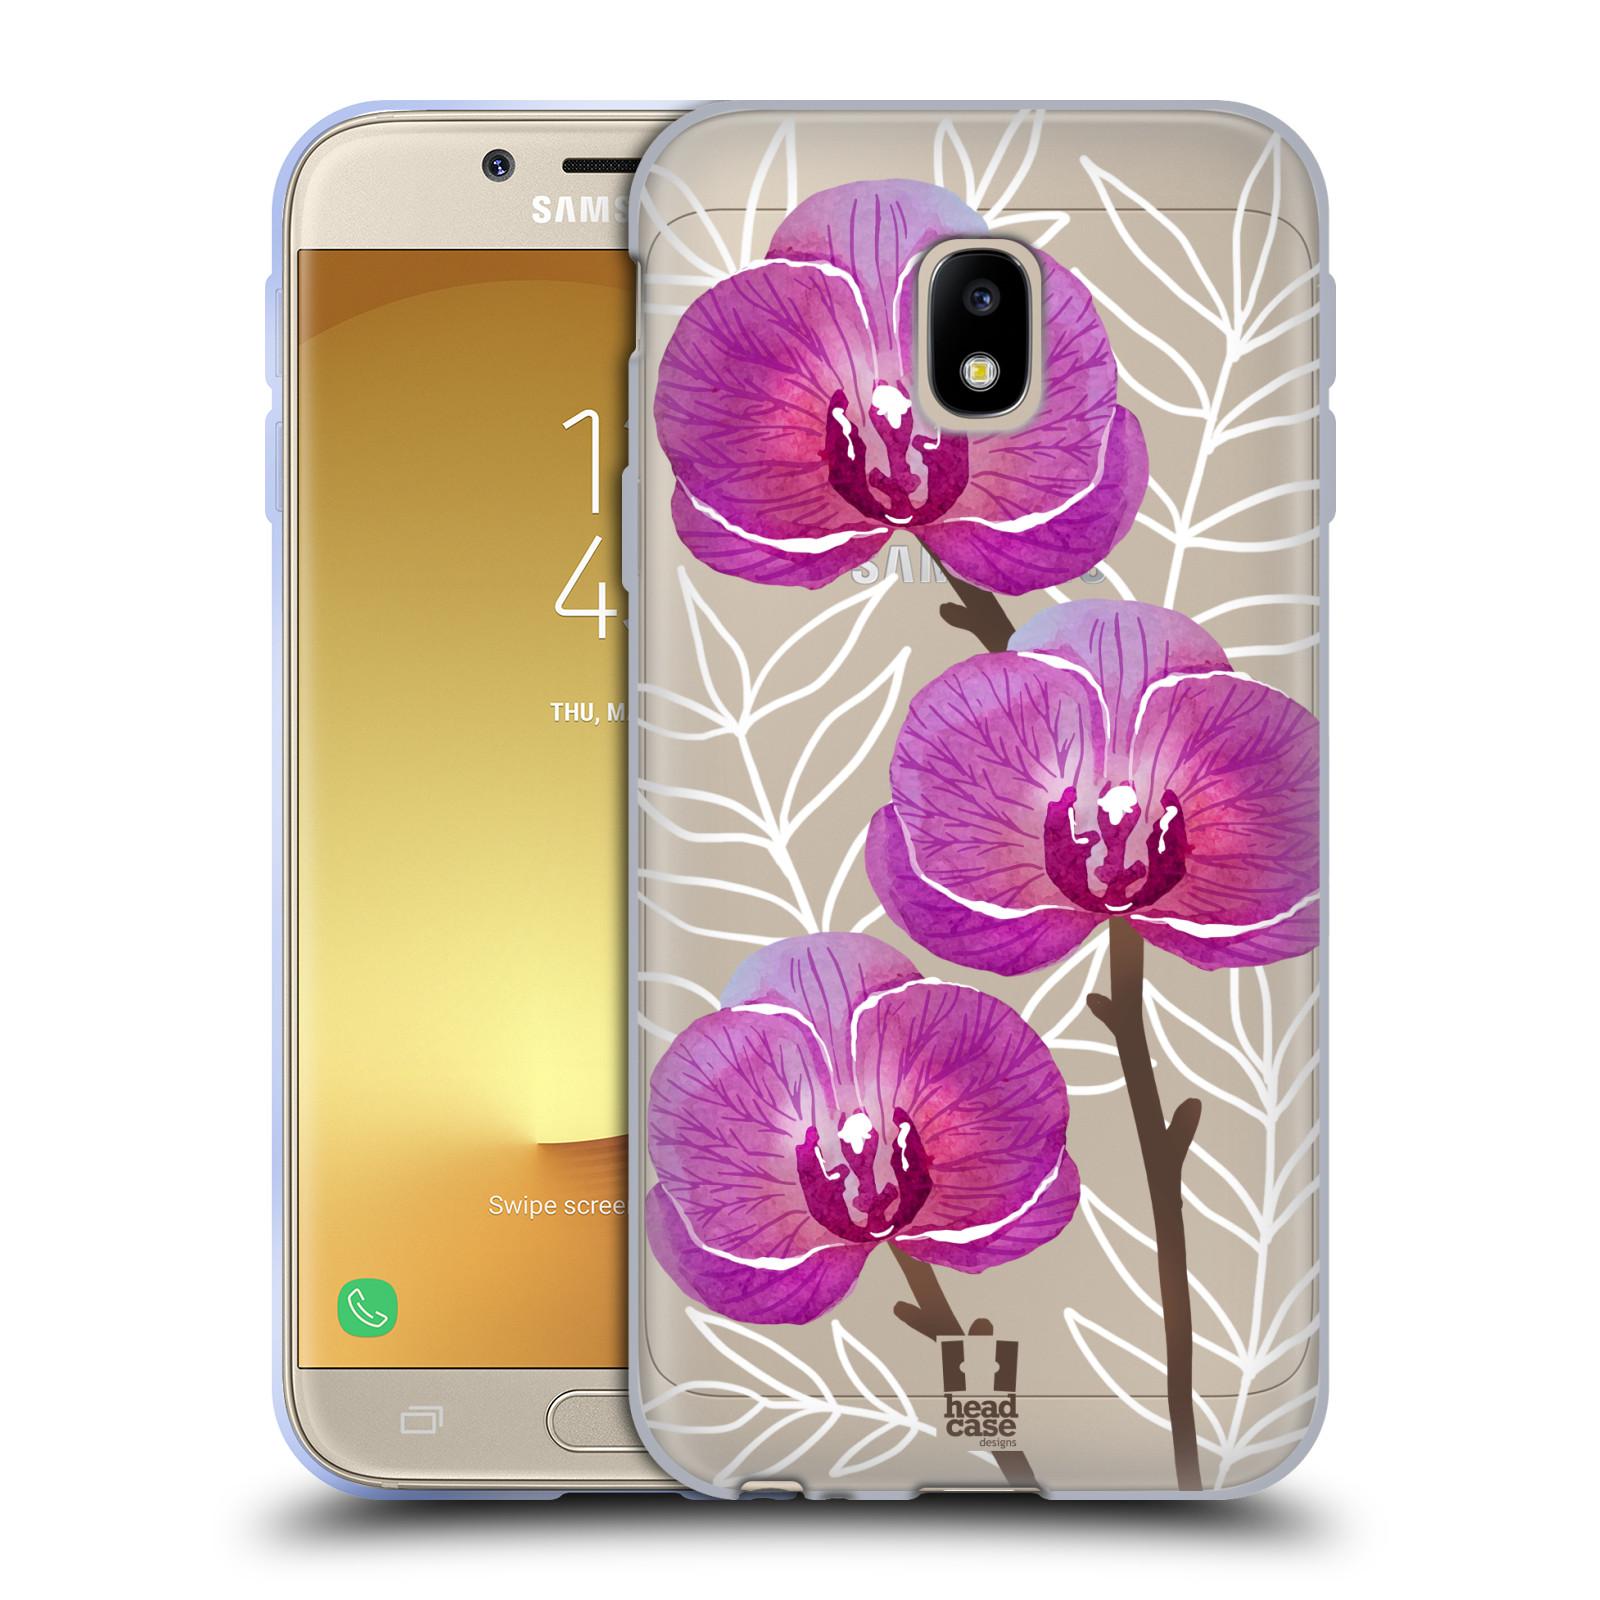 Silikonové pouzdro na mobil Samsung Galaxy J3 (2017) - Head Case - Hezoučké  kvítky empty 545d4221179